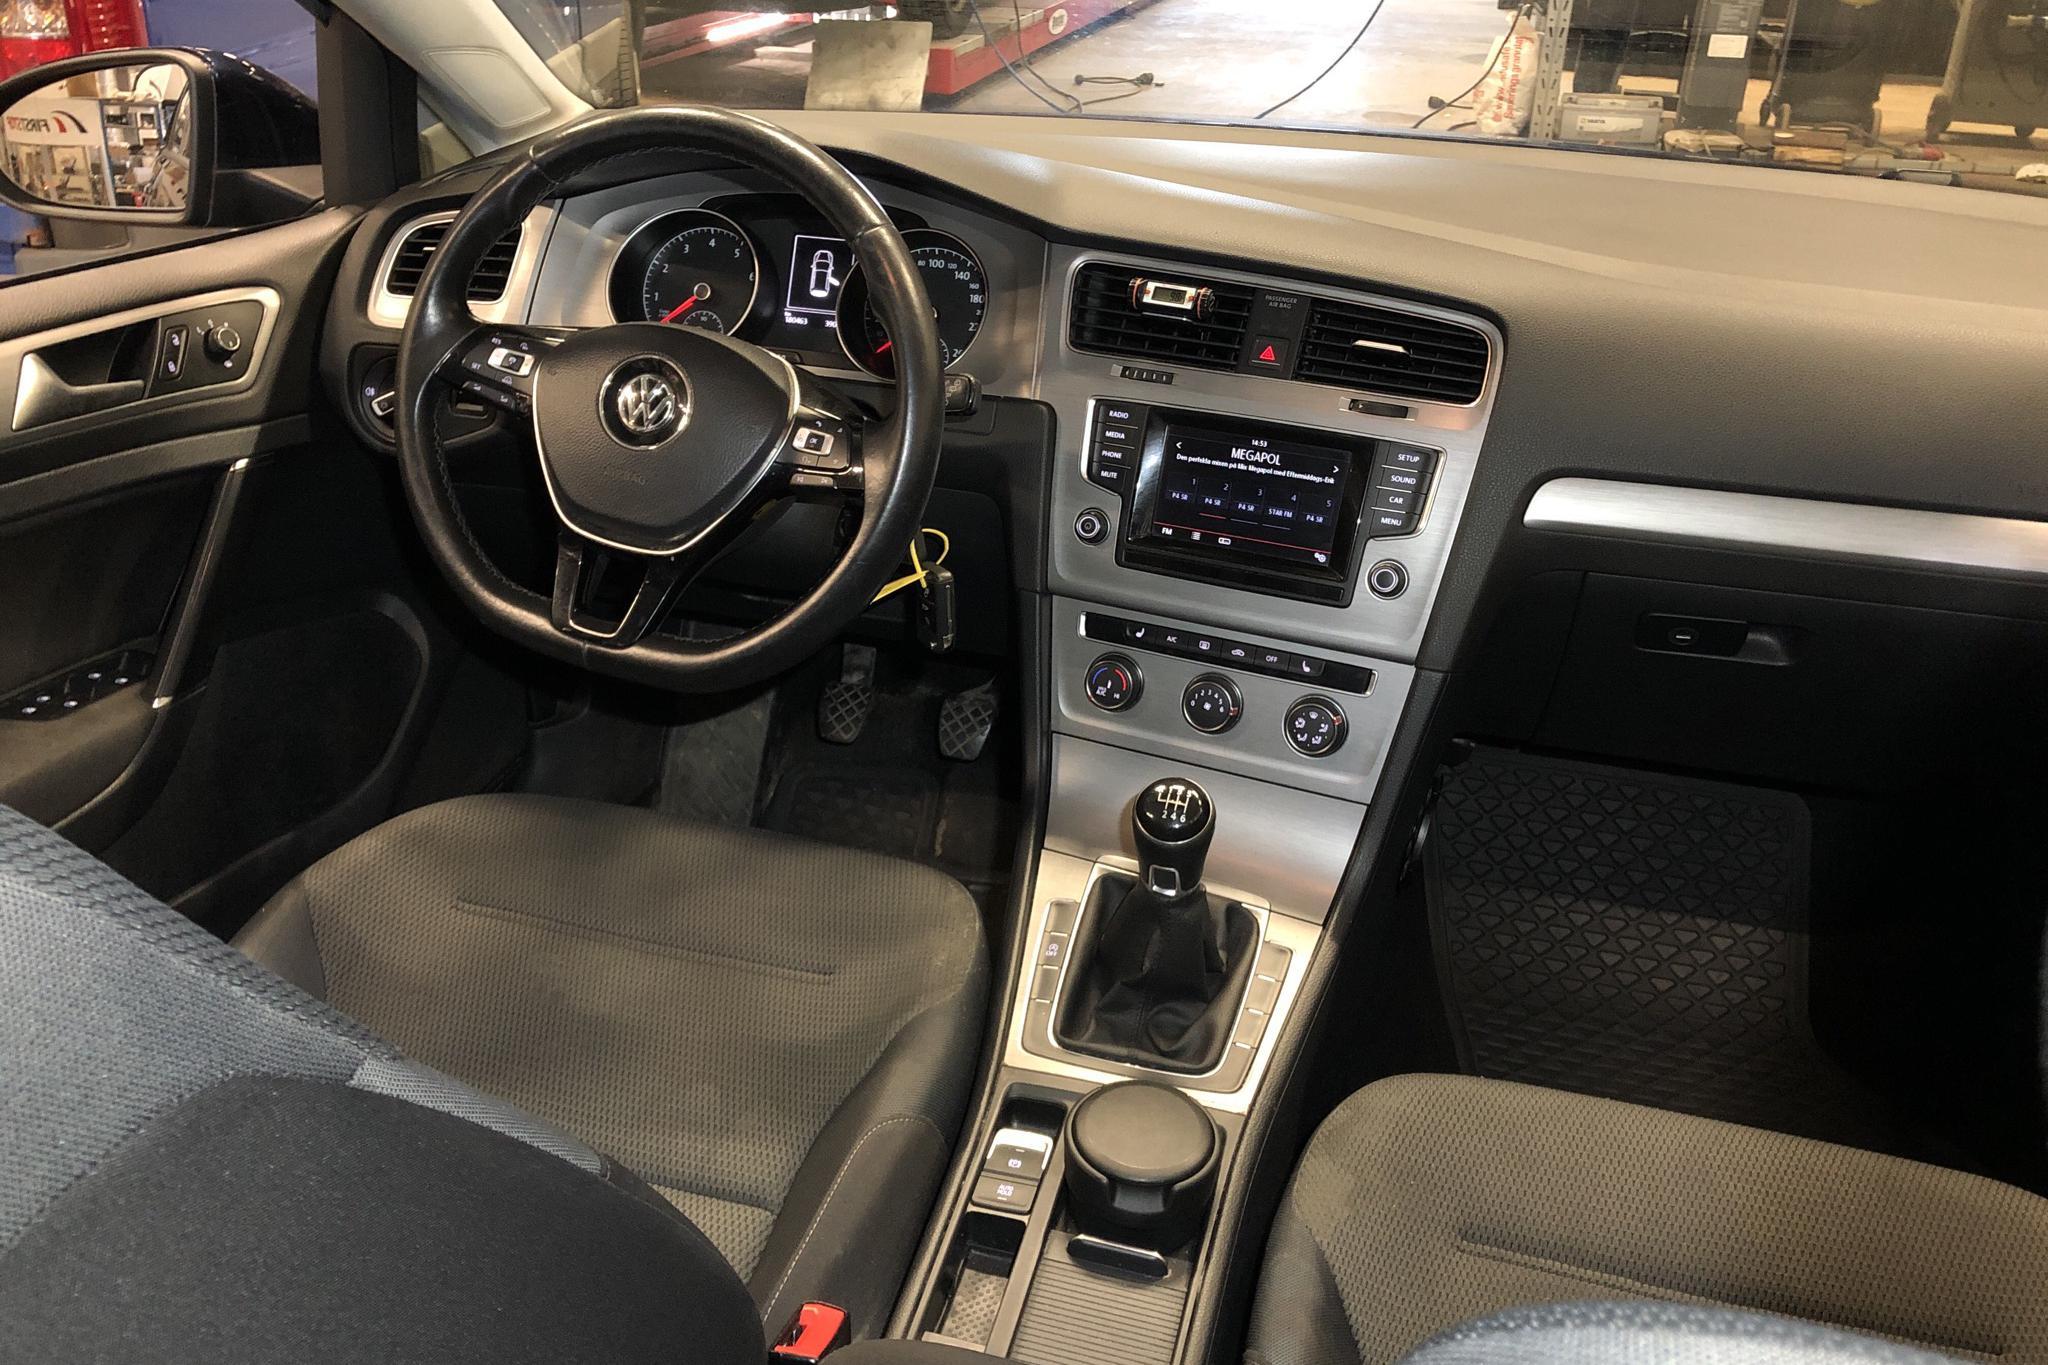 VW Golf VII 1.4 TSI Multifuel 5dr (125hk) - 180 470 km - Manual - Dark Blue - 2015